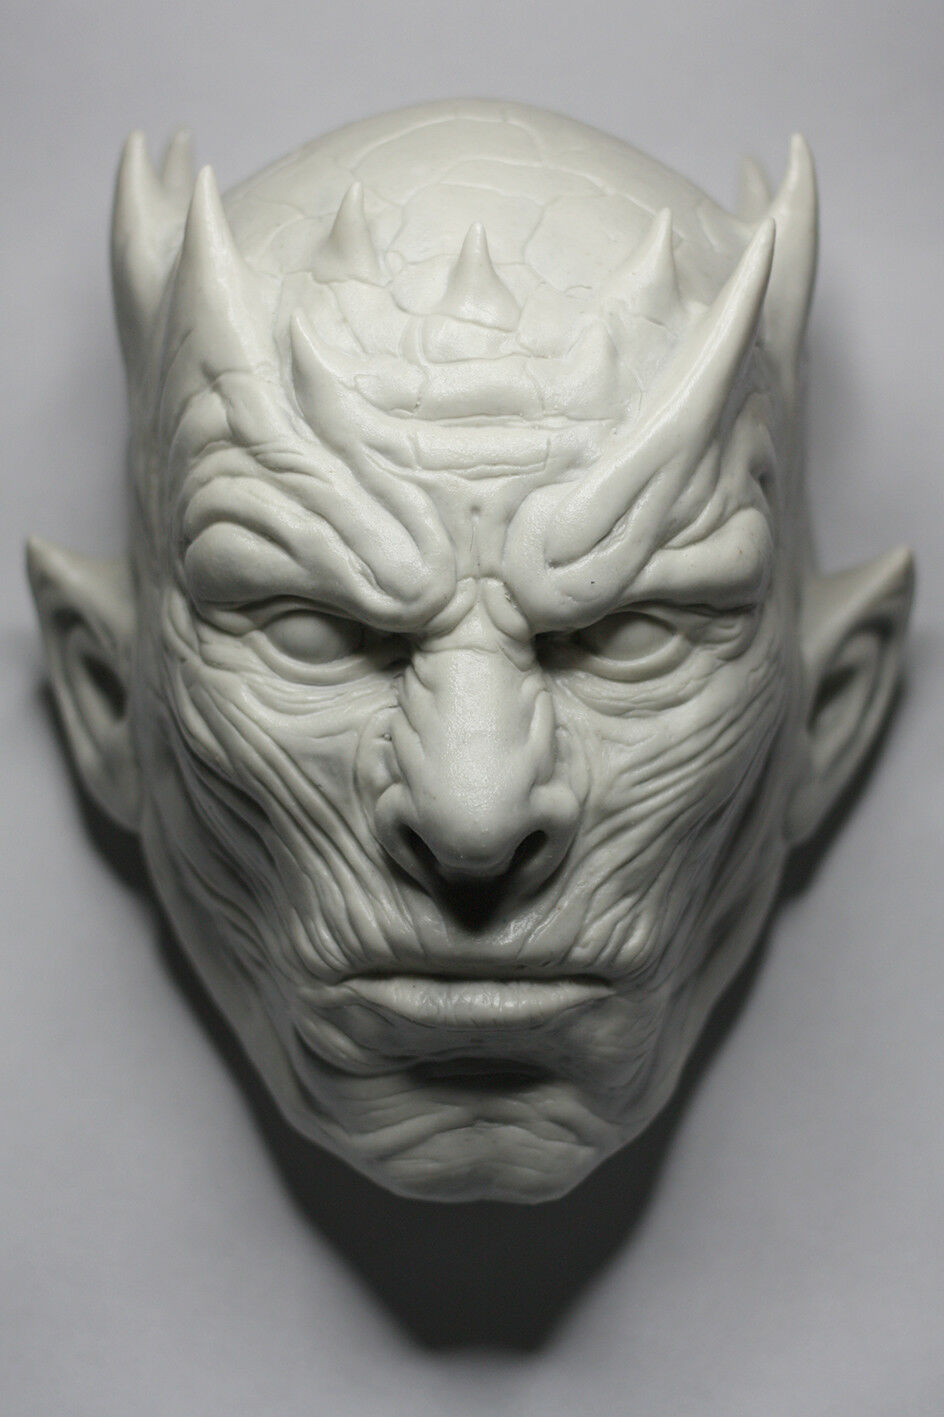 Game of Thrones White walker fantasy demon sculpture resin model garage kit prop